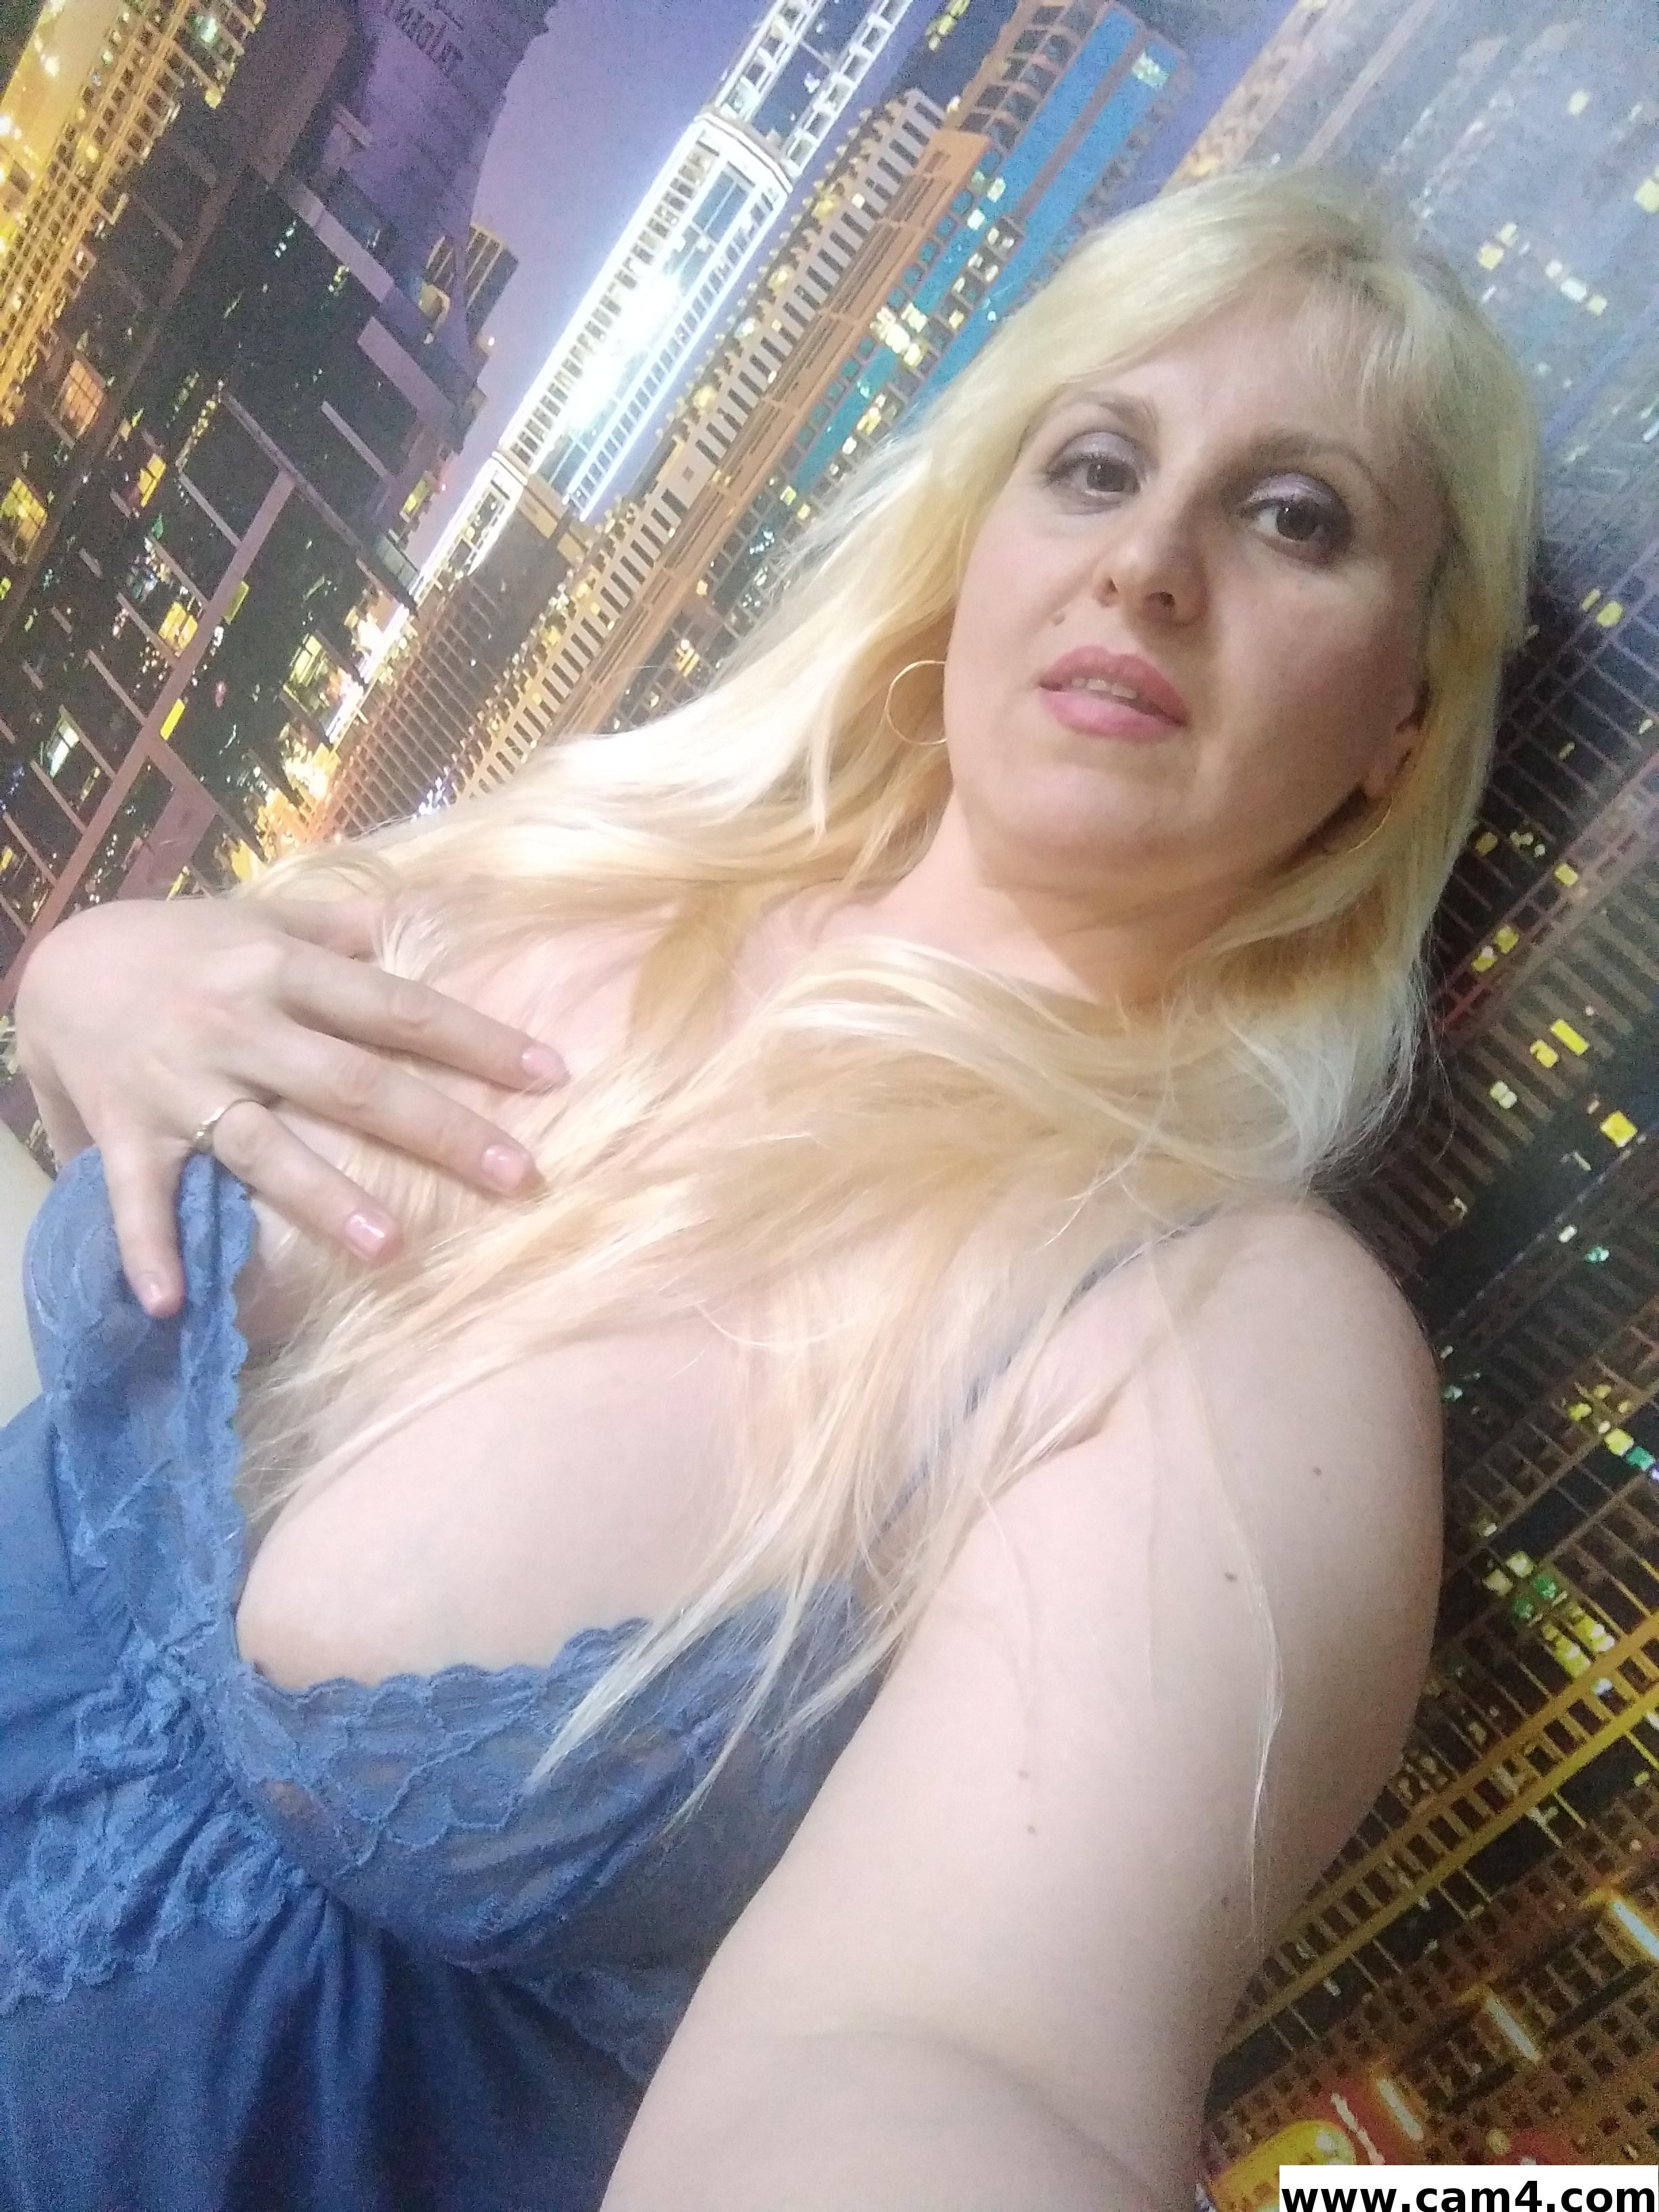 Blondabella?s=q+z449wqtogt+tpybvayxwmgigo6shmv8gkqn1edguw=